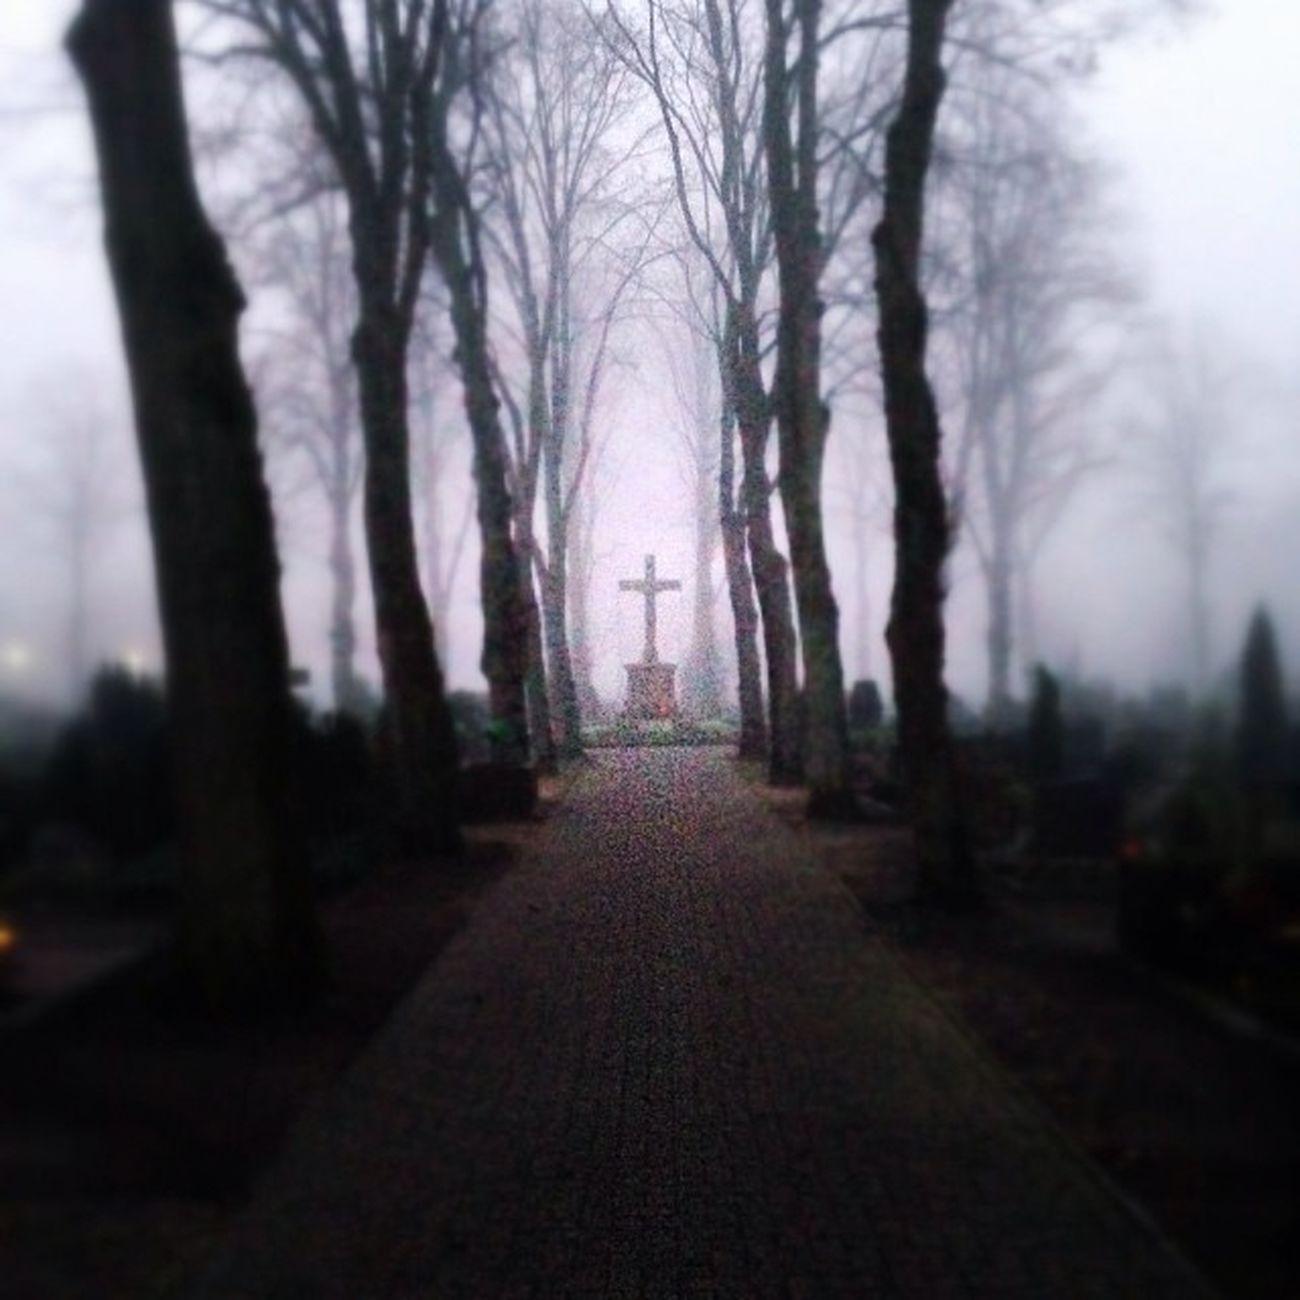 Katholischer Friedhof gronau Nebel Friedhof Gronau Snapseed Fog Kreuz  Watnesuppe IPhone5